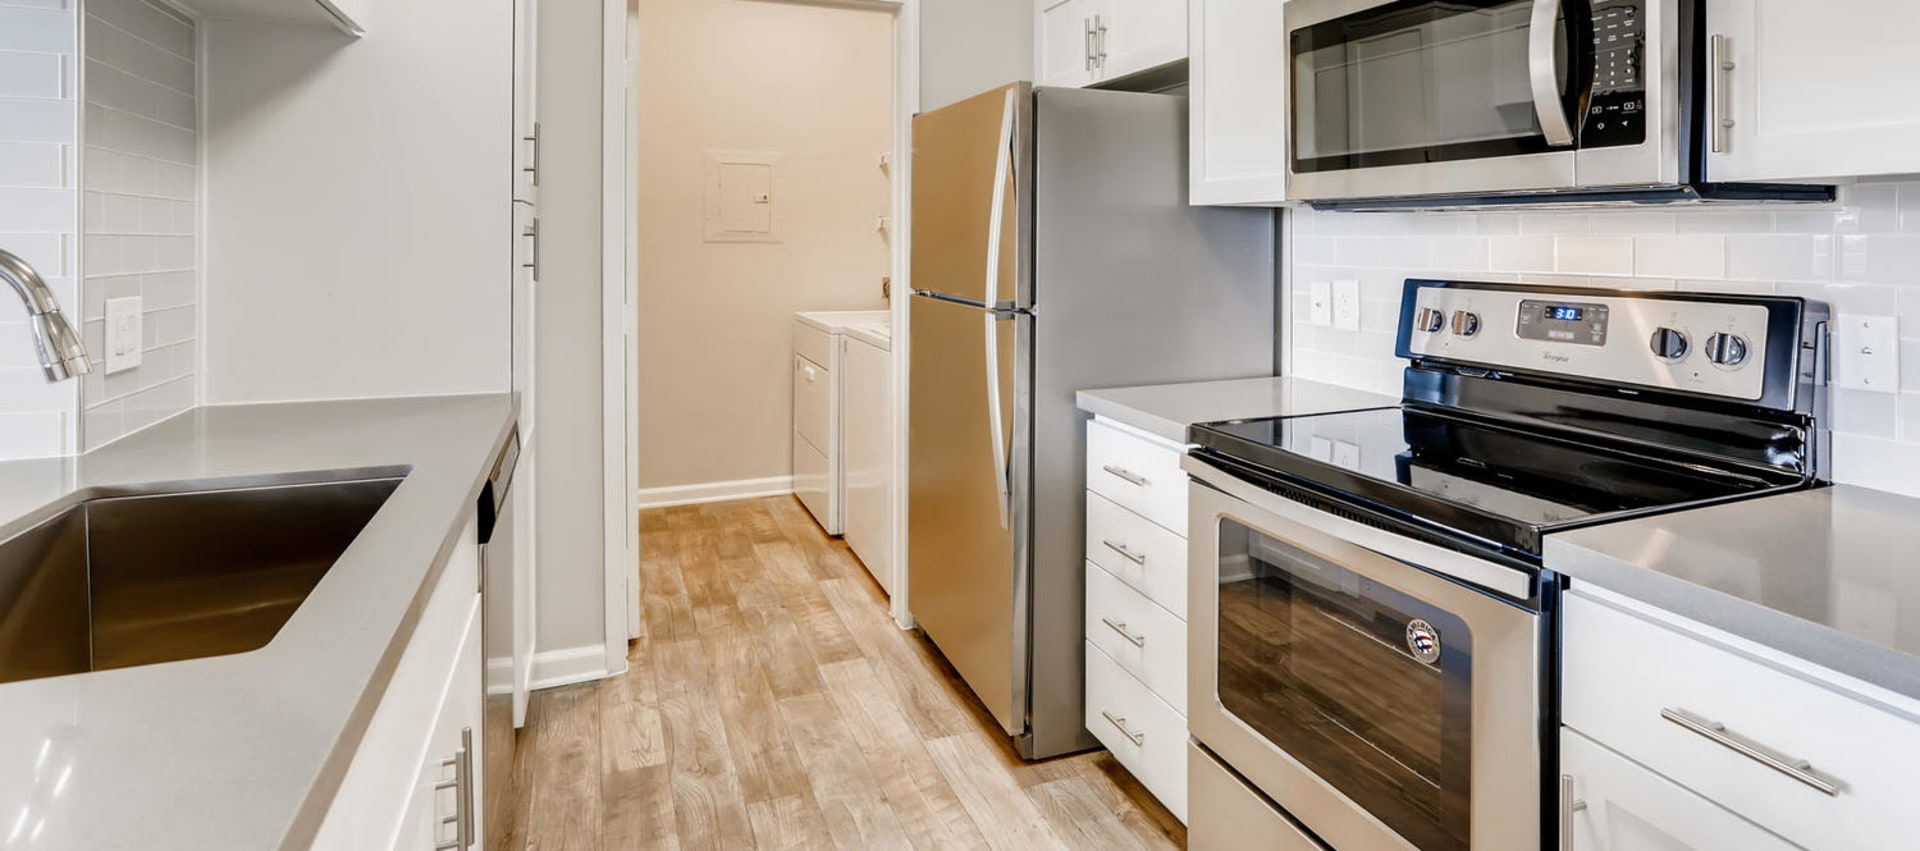 Kitchen at Alize at Aliso Viejo Apartment Homes in Aliso Viejo, California